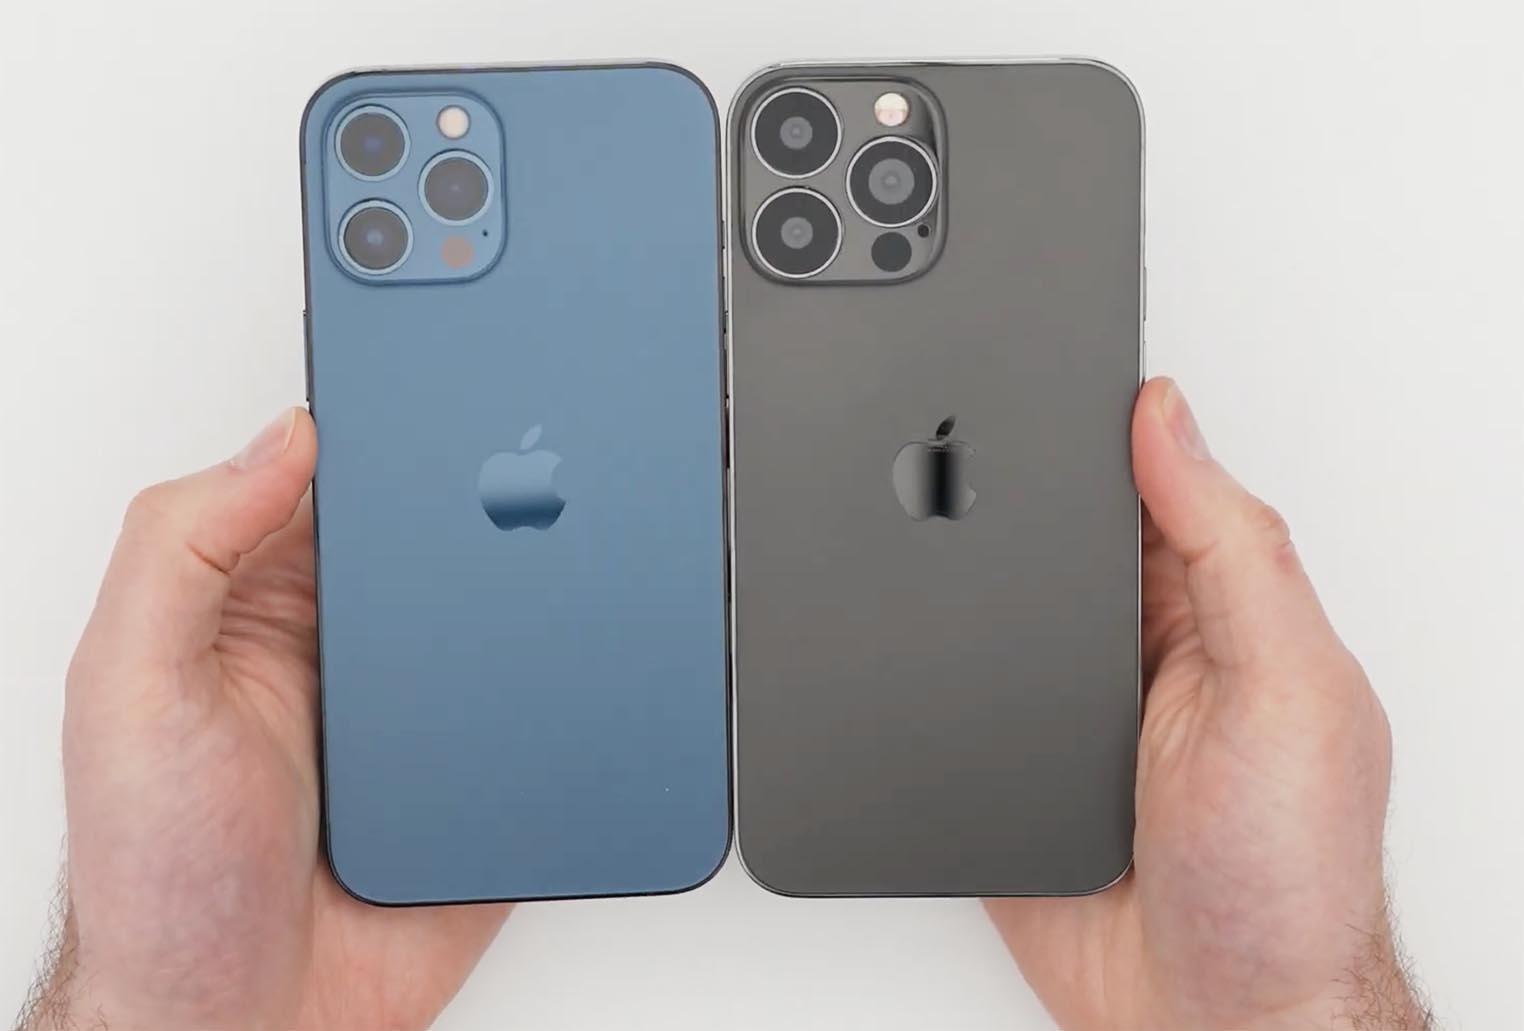 Maquette iPhone 13 Pro Max